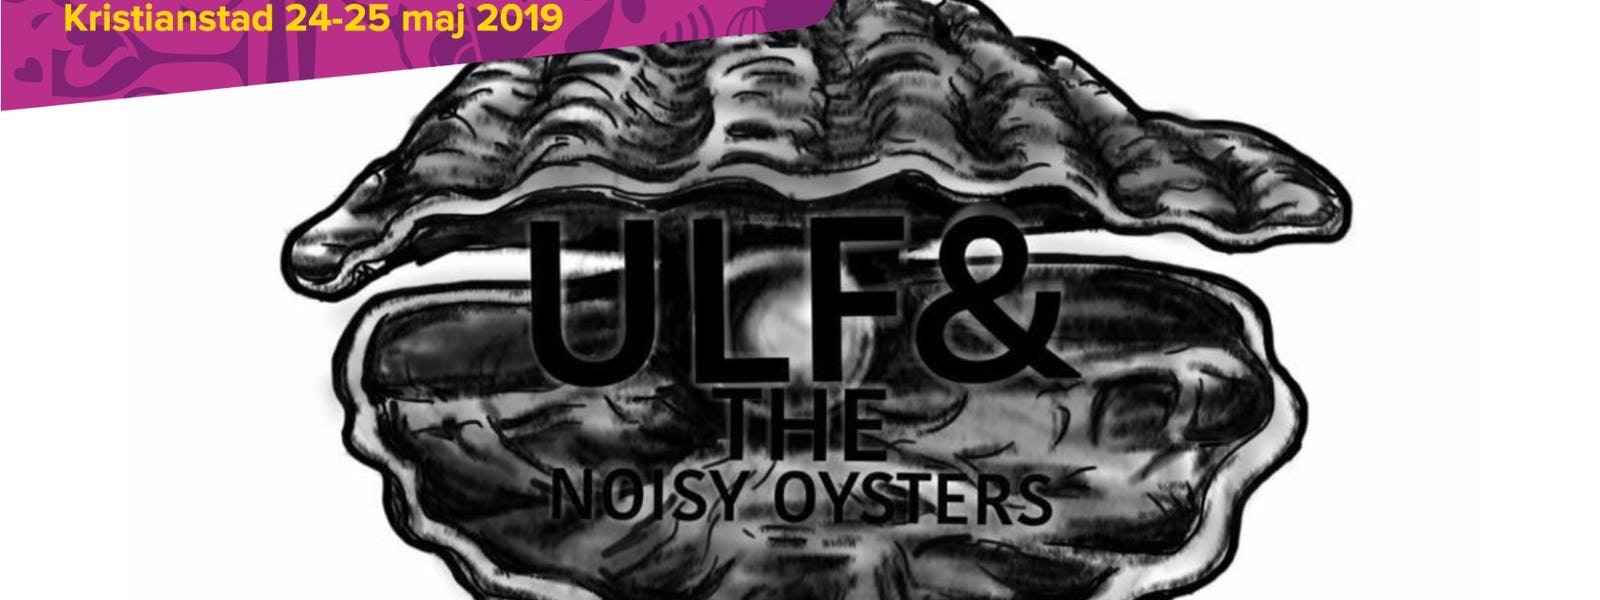 Bild - Ulf & the noisy Oysters